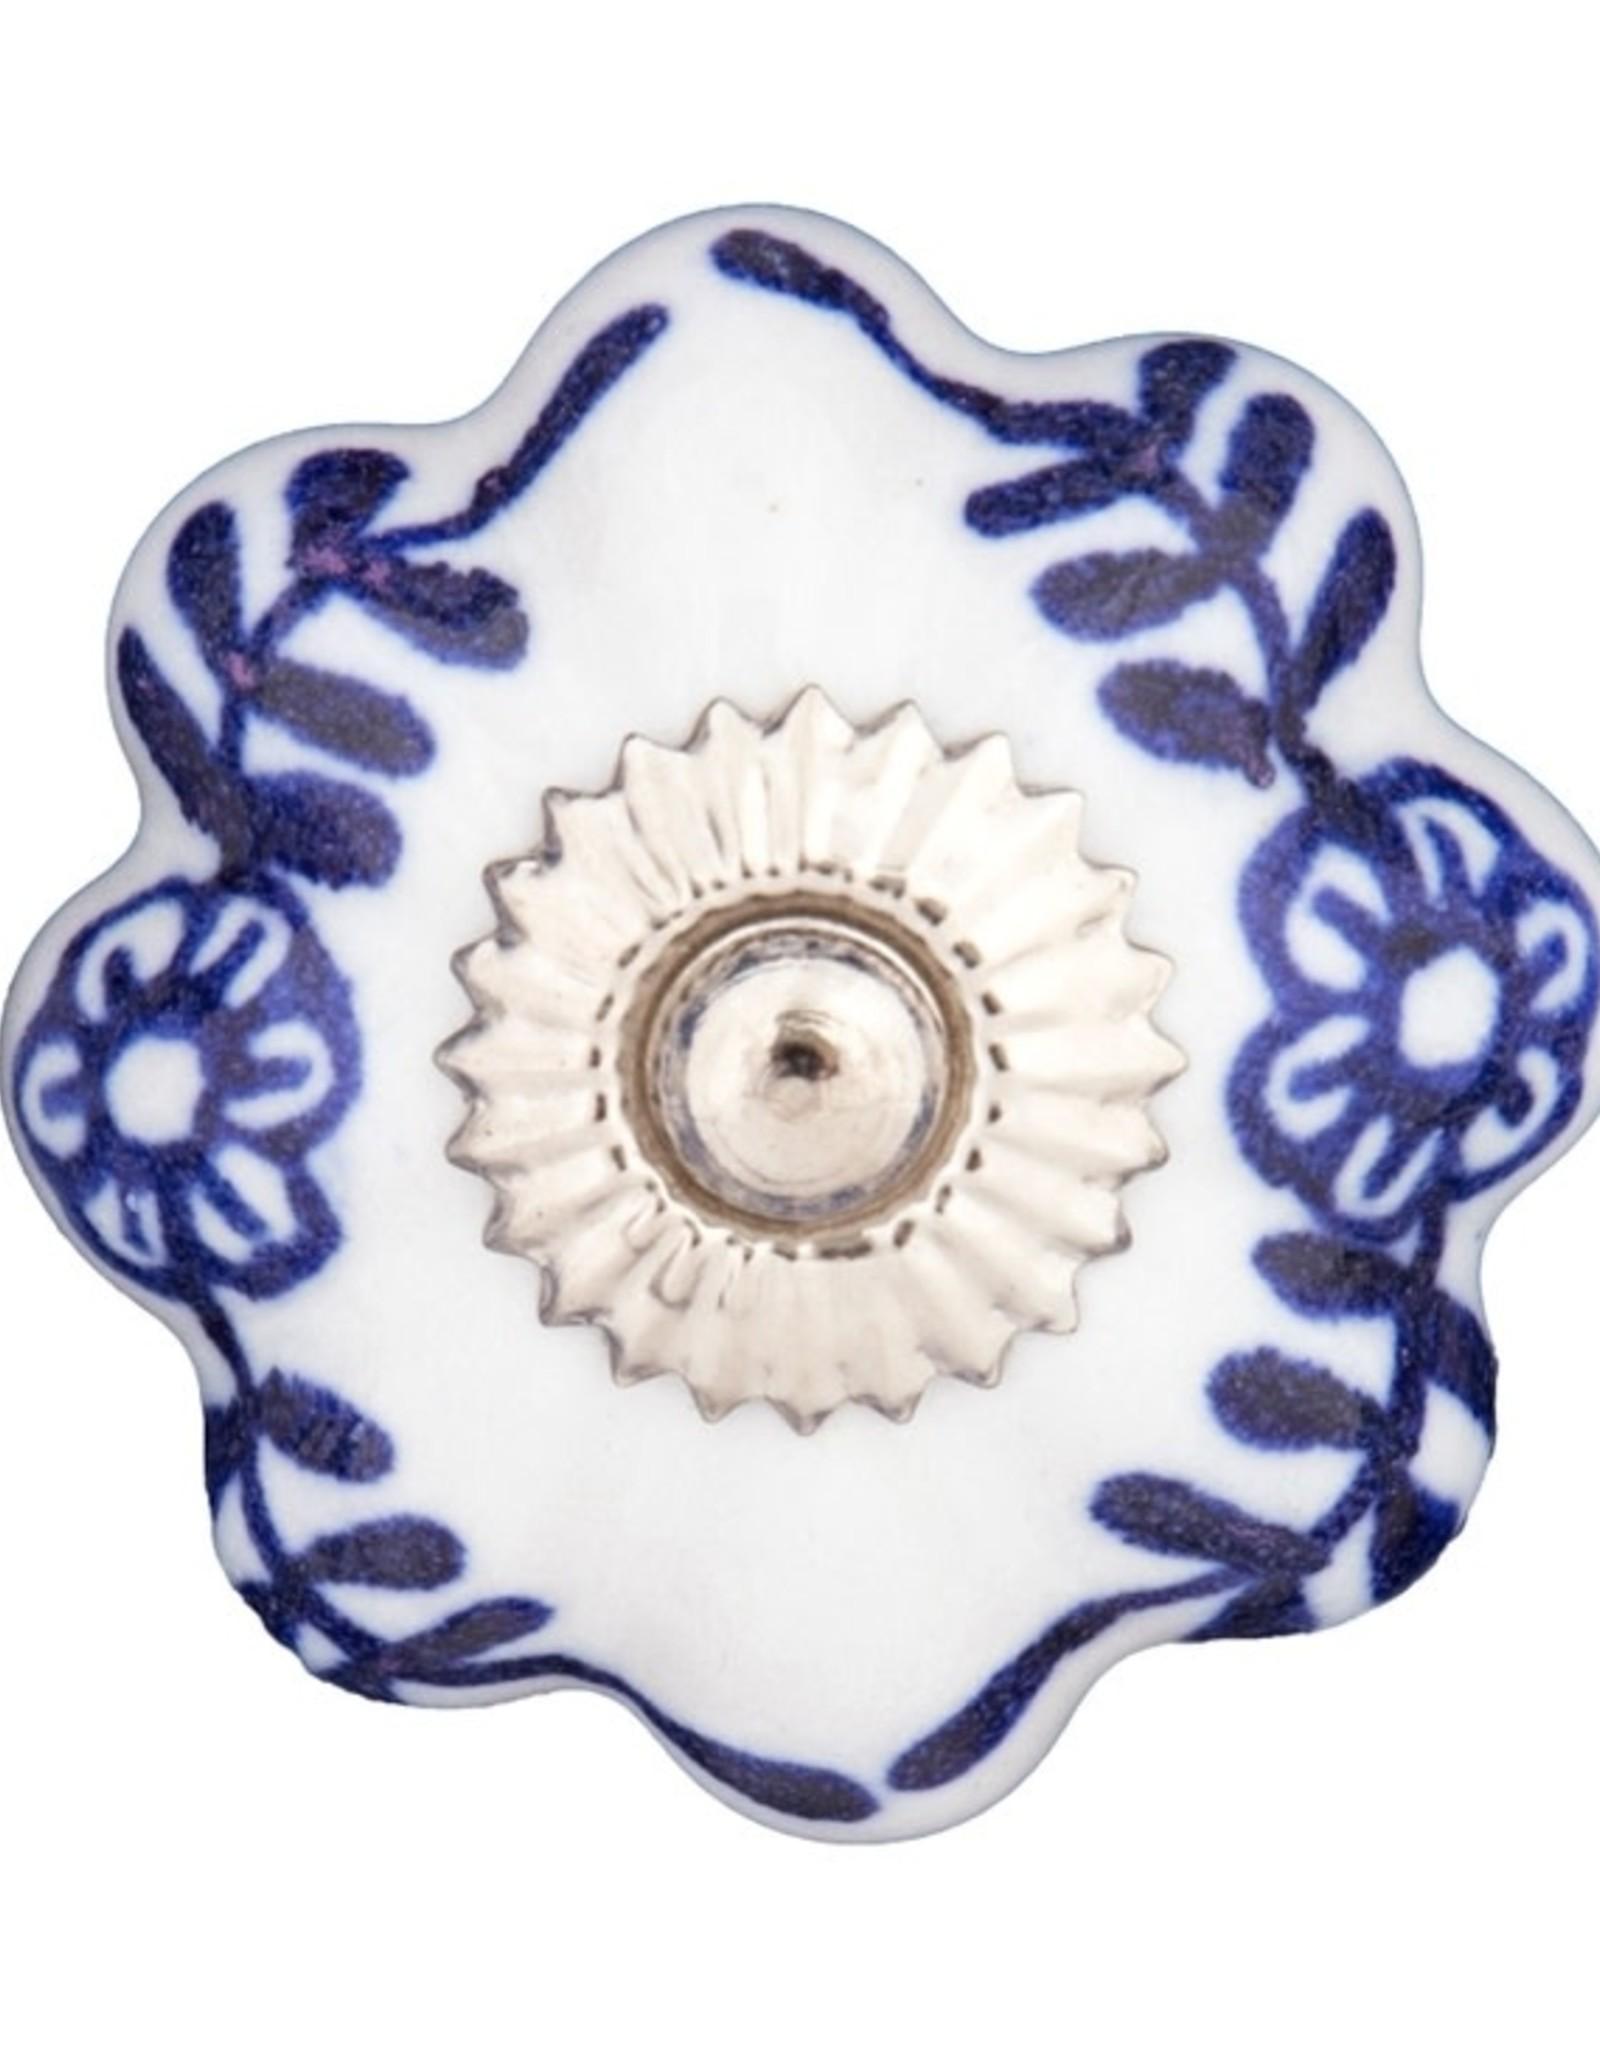 Mela Artisans Chambal Gardens Painted Daisies Ceramic Knob Indigo